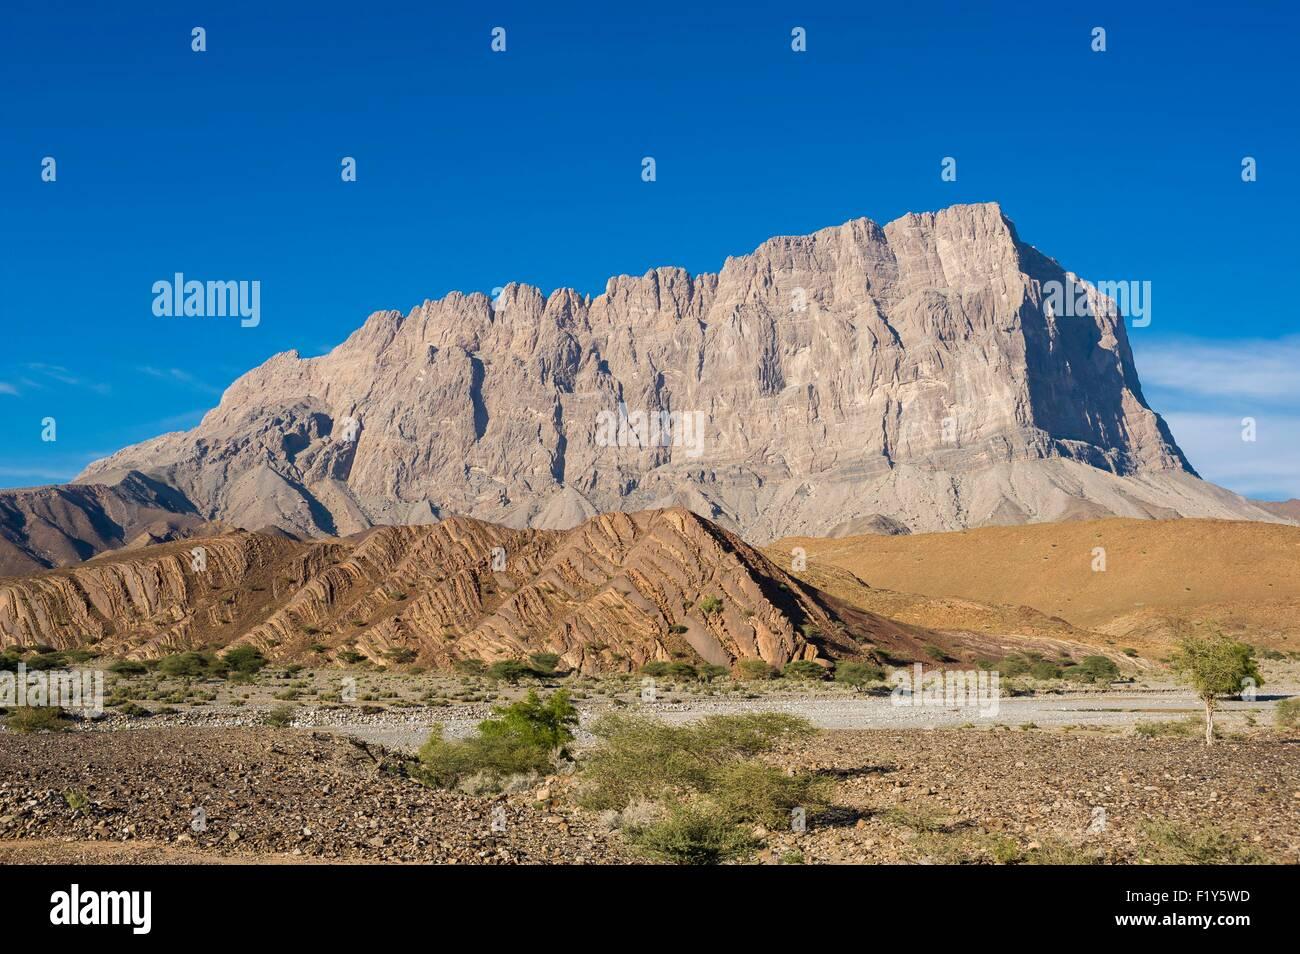 Oman, Ad-Dhakhiliyah, El Ayn, Djebel Misht, famous climbing spot - Stock Image